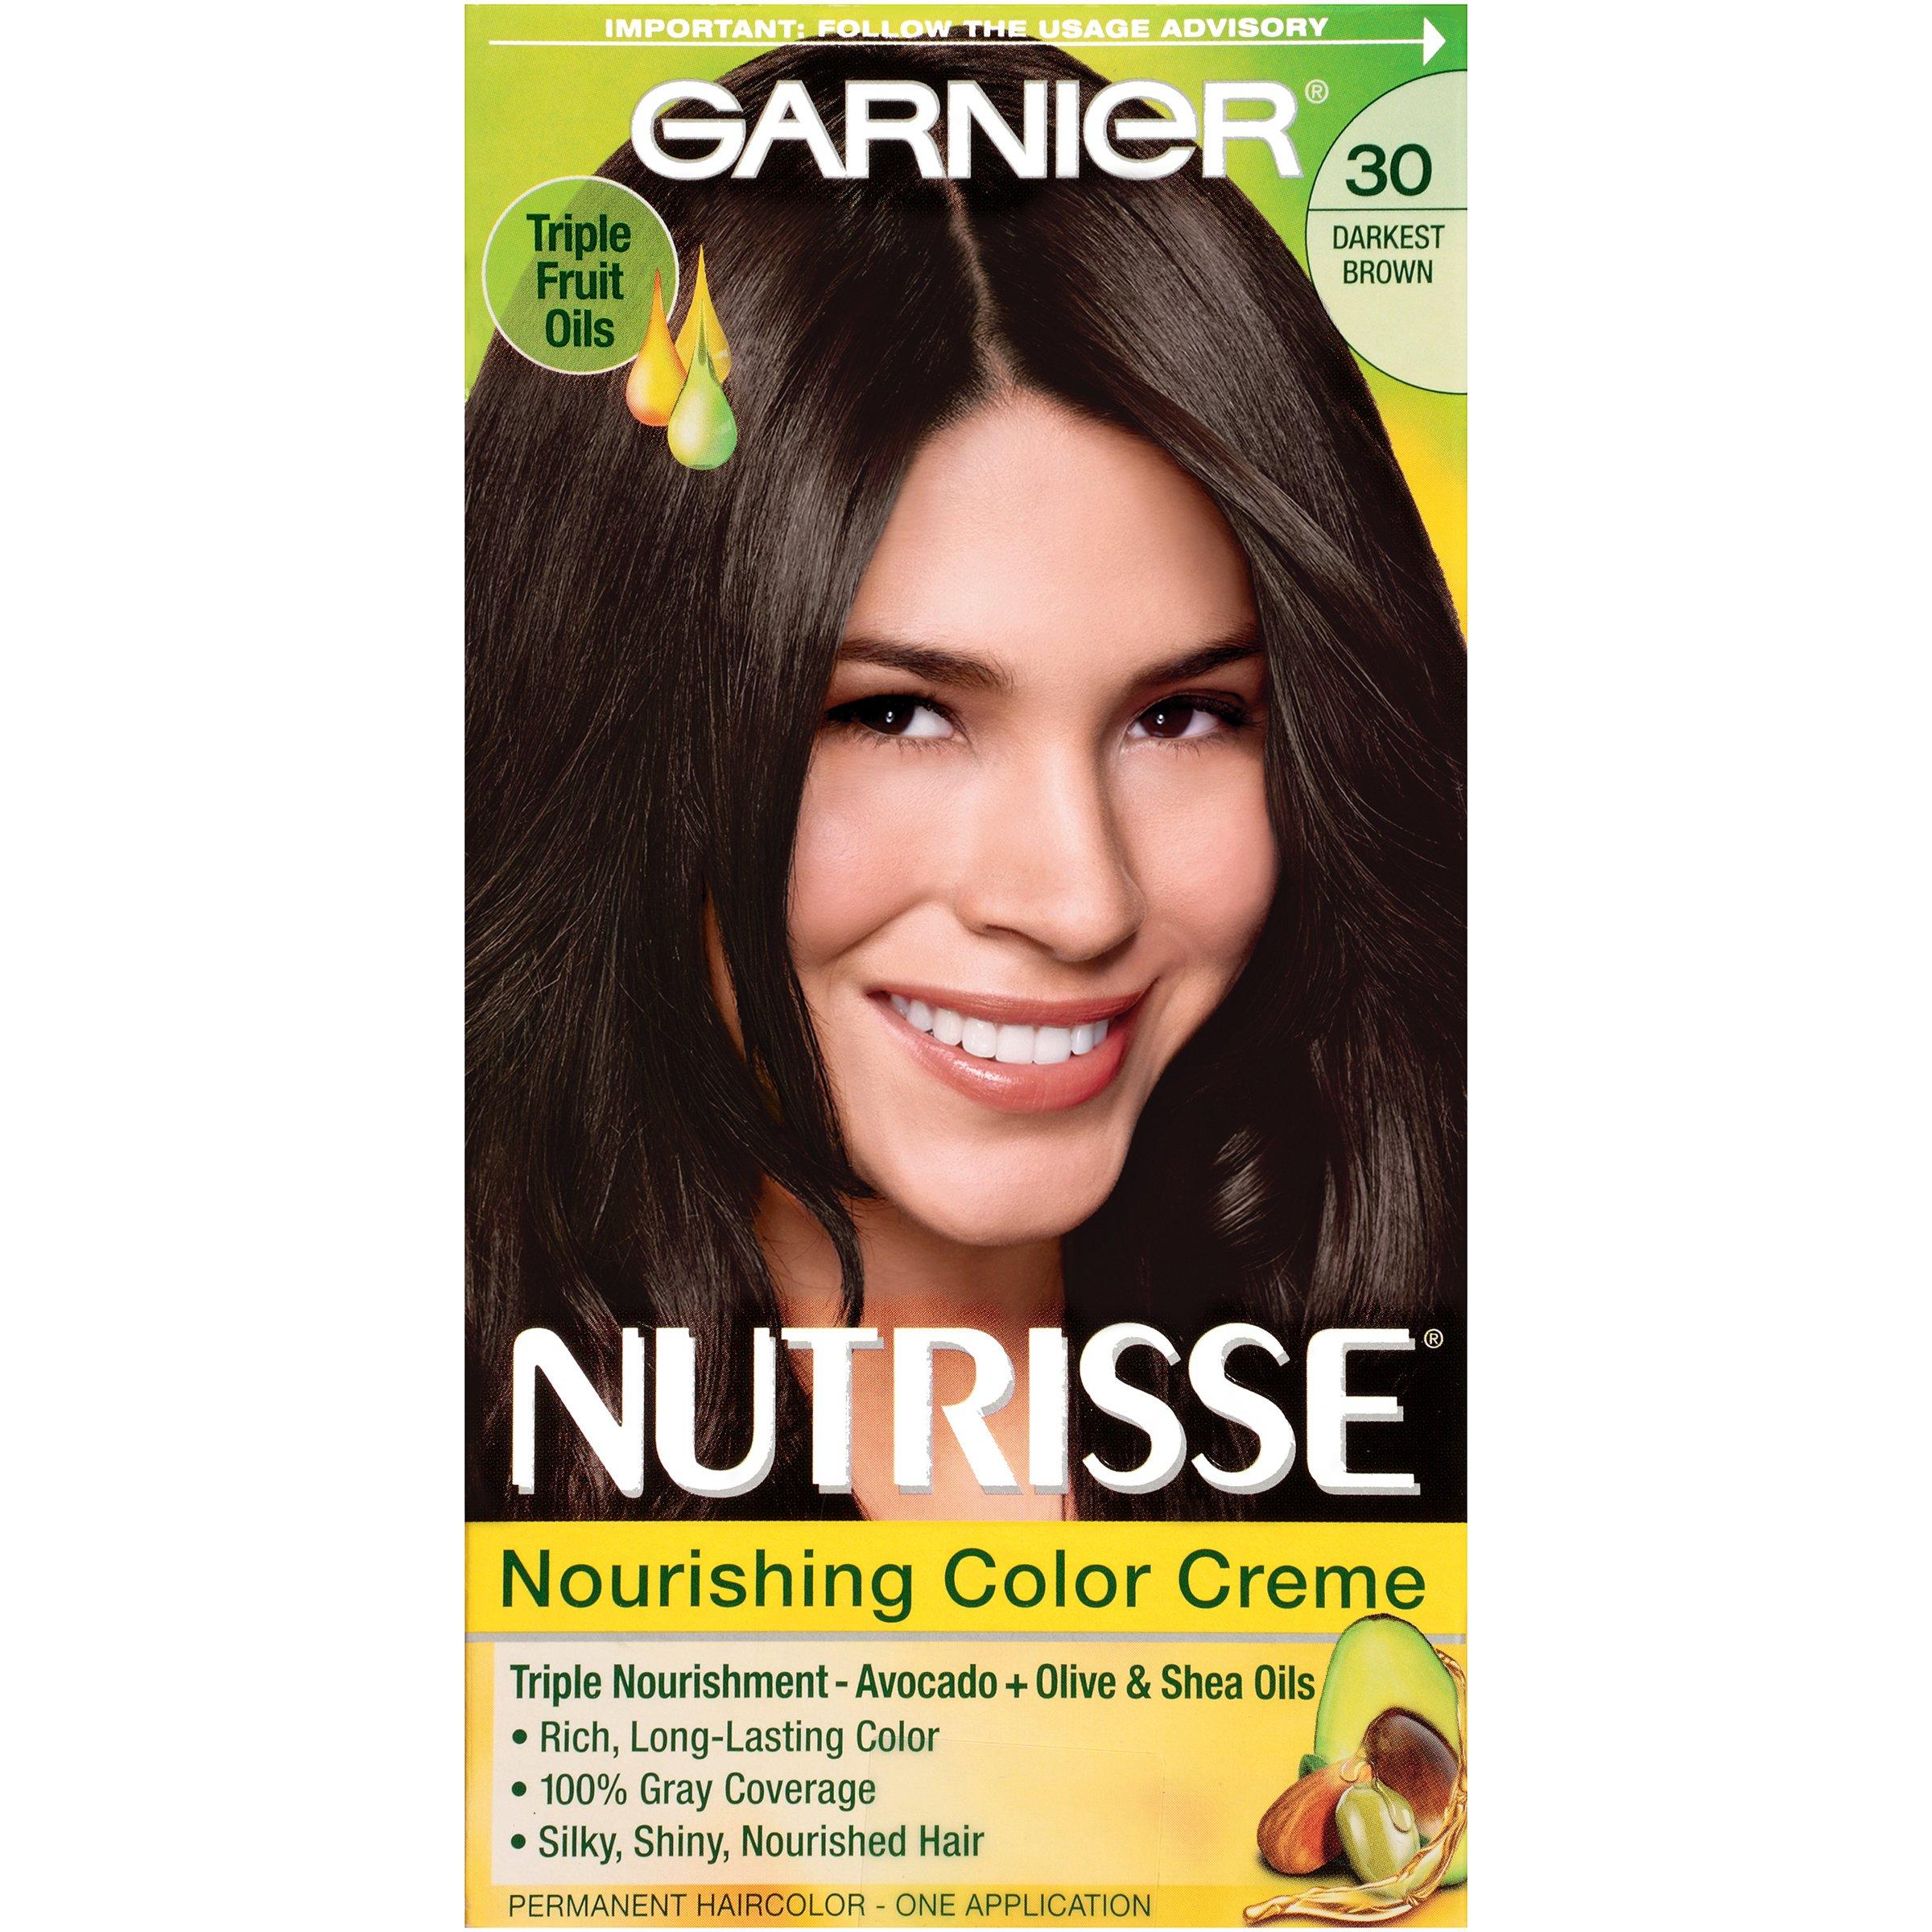 Amazon.com : Garnier Nutrisse Haircolor, R1 Dark Intense ...